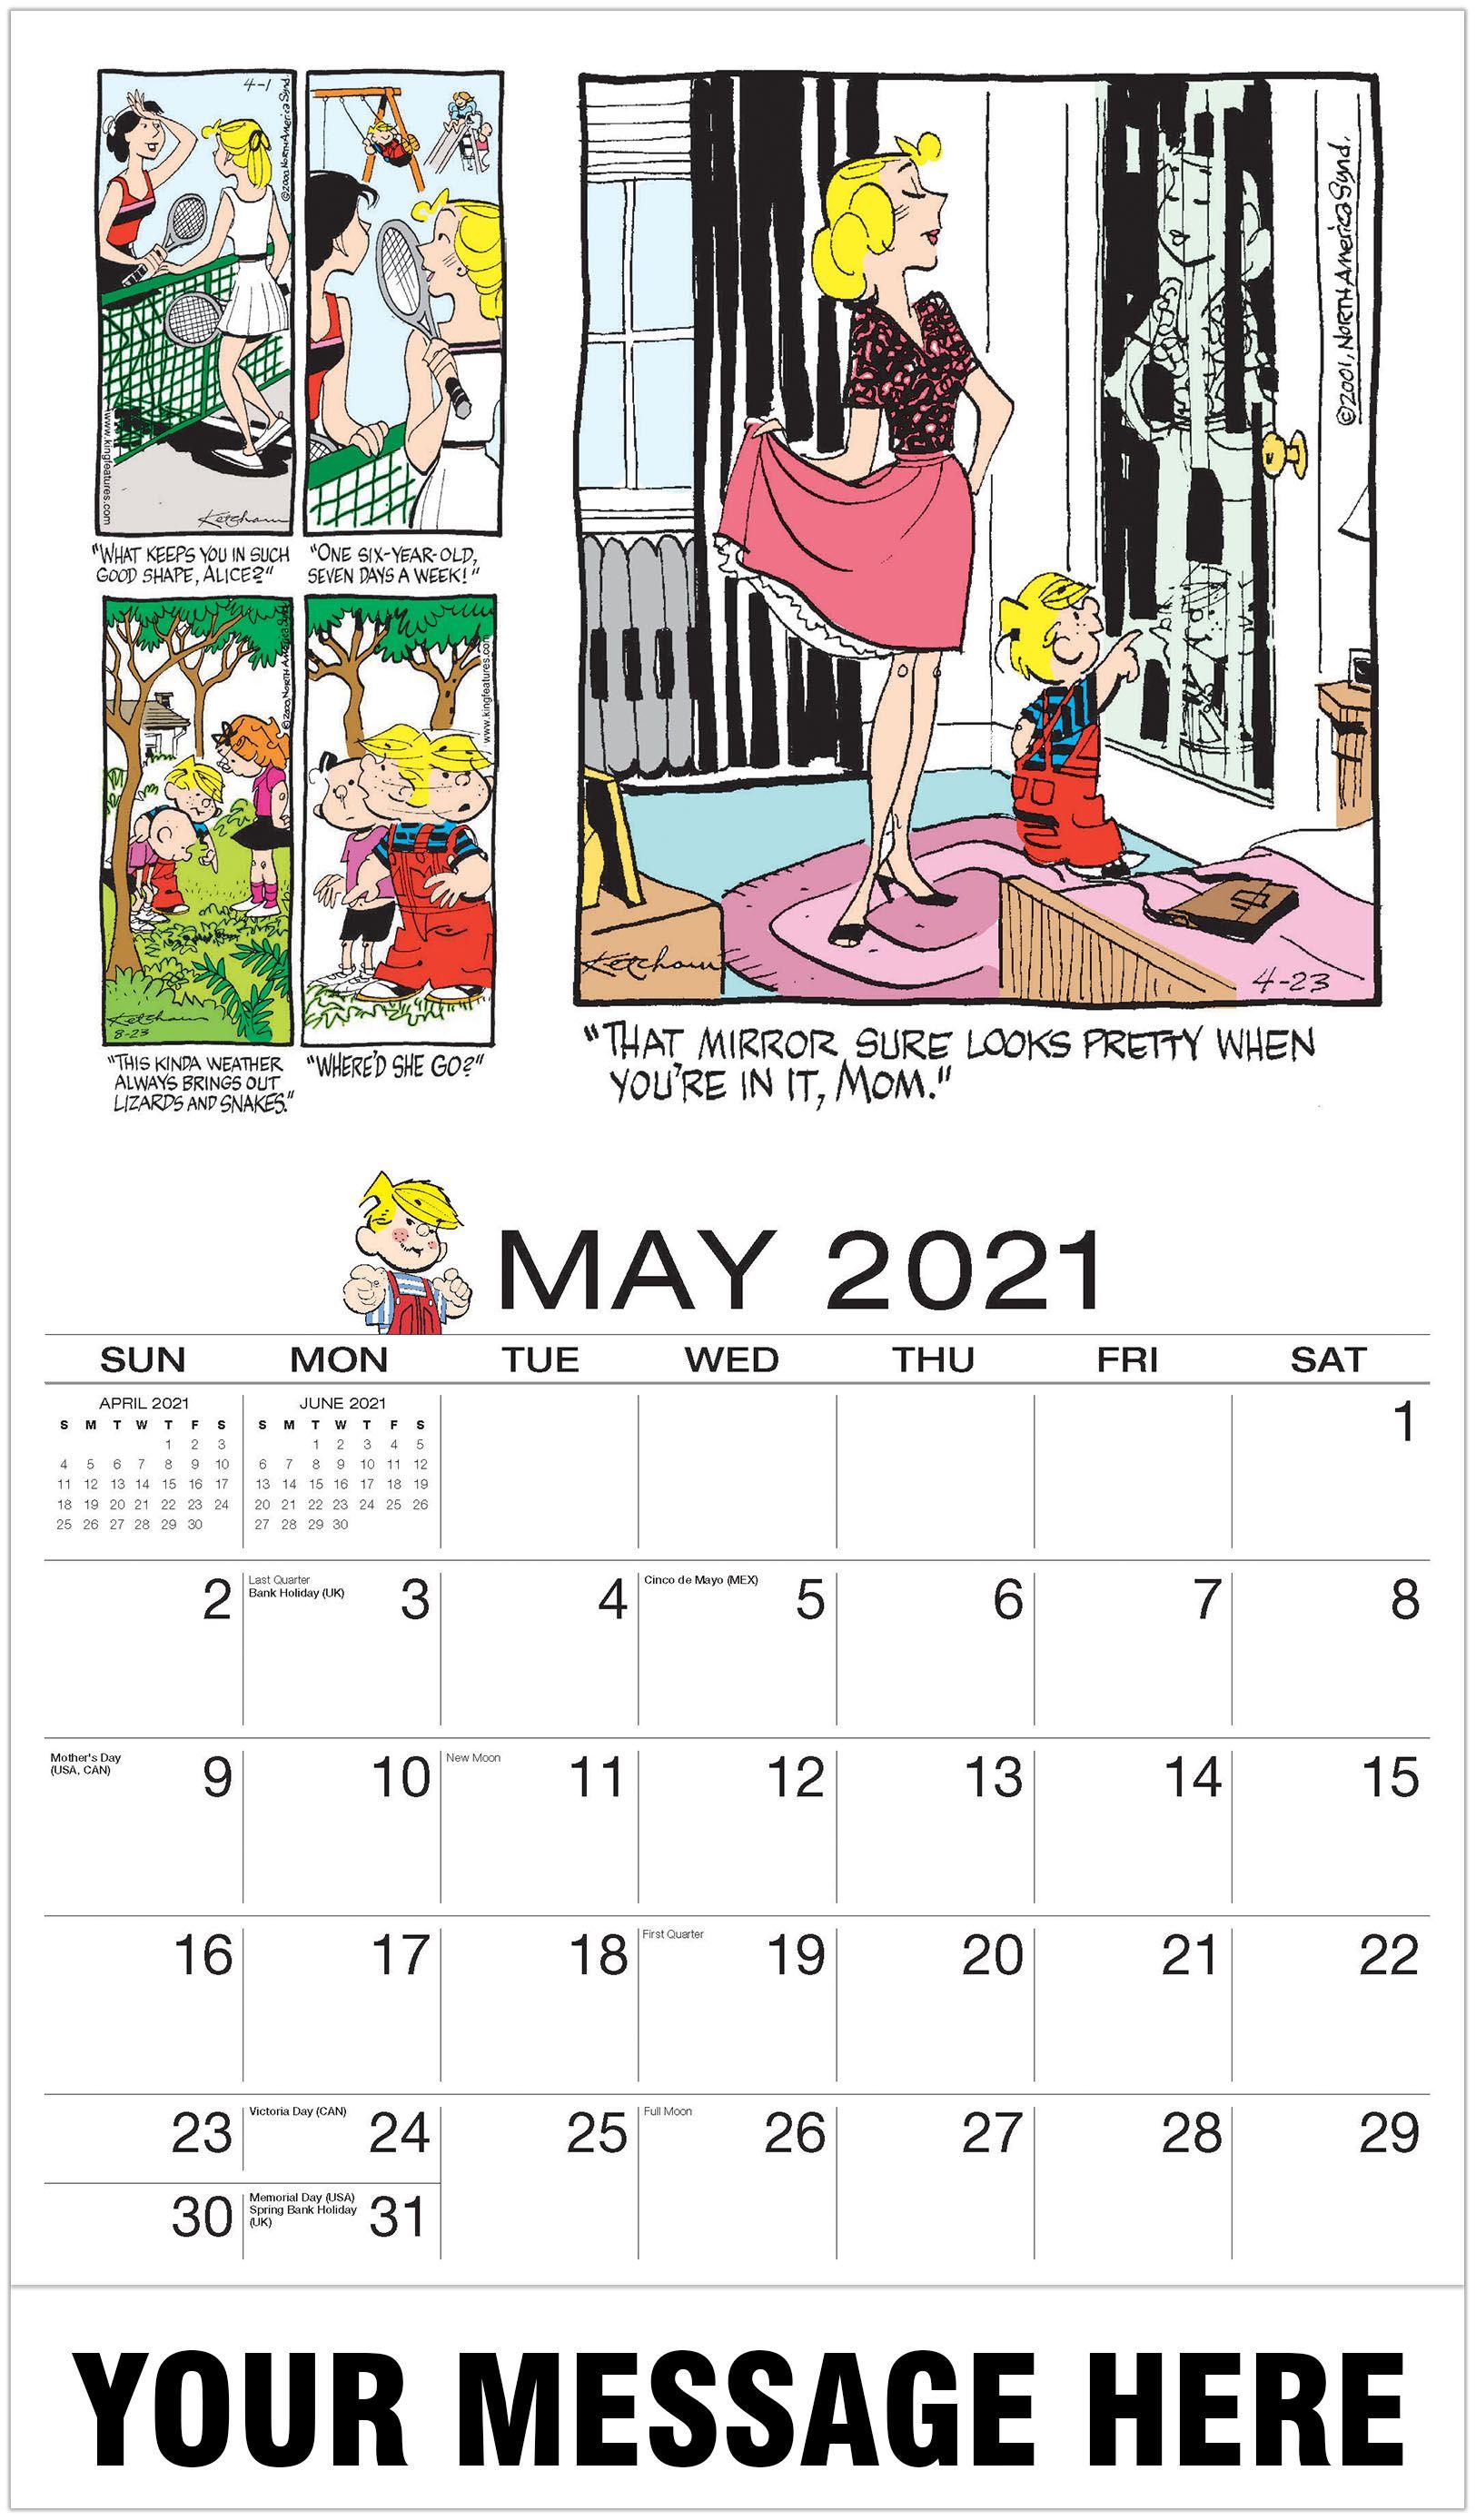 Dennis The Menace In 2020 Dennis The Menace Art Calendar Promotional Calendar